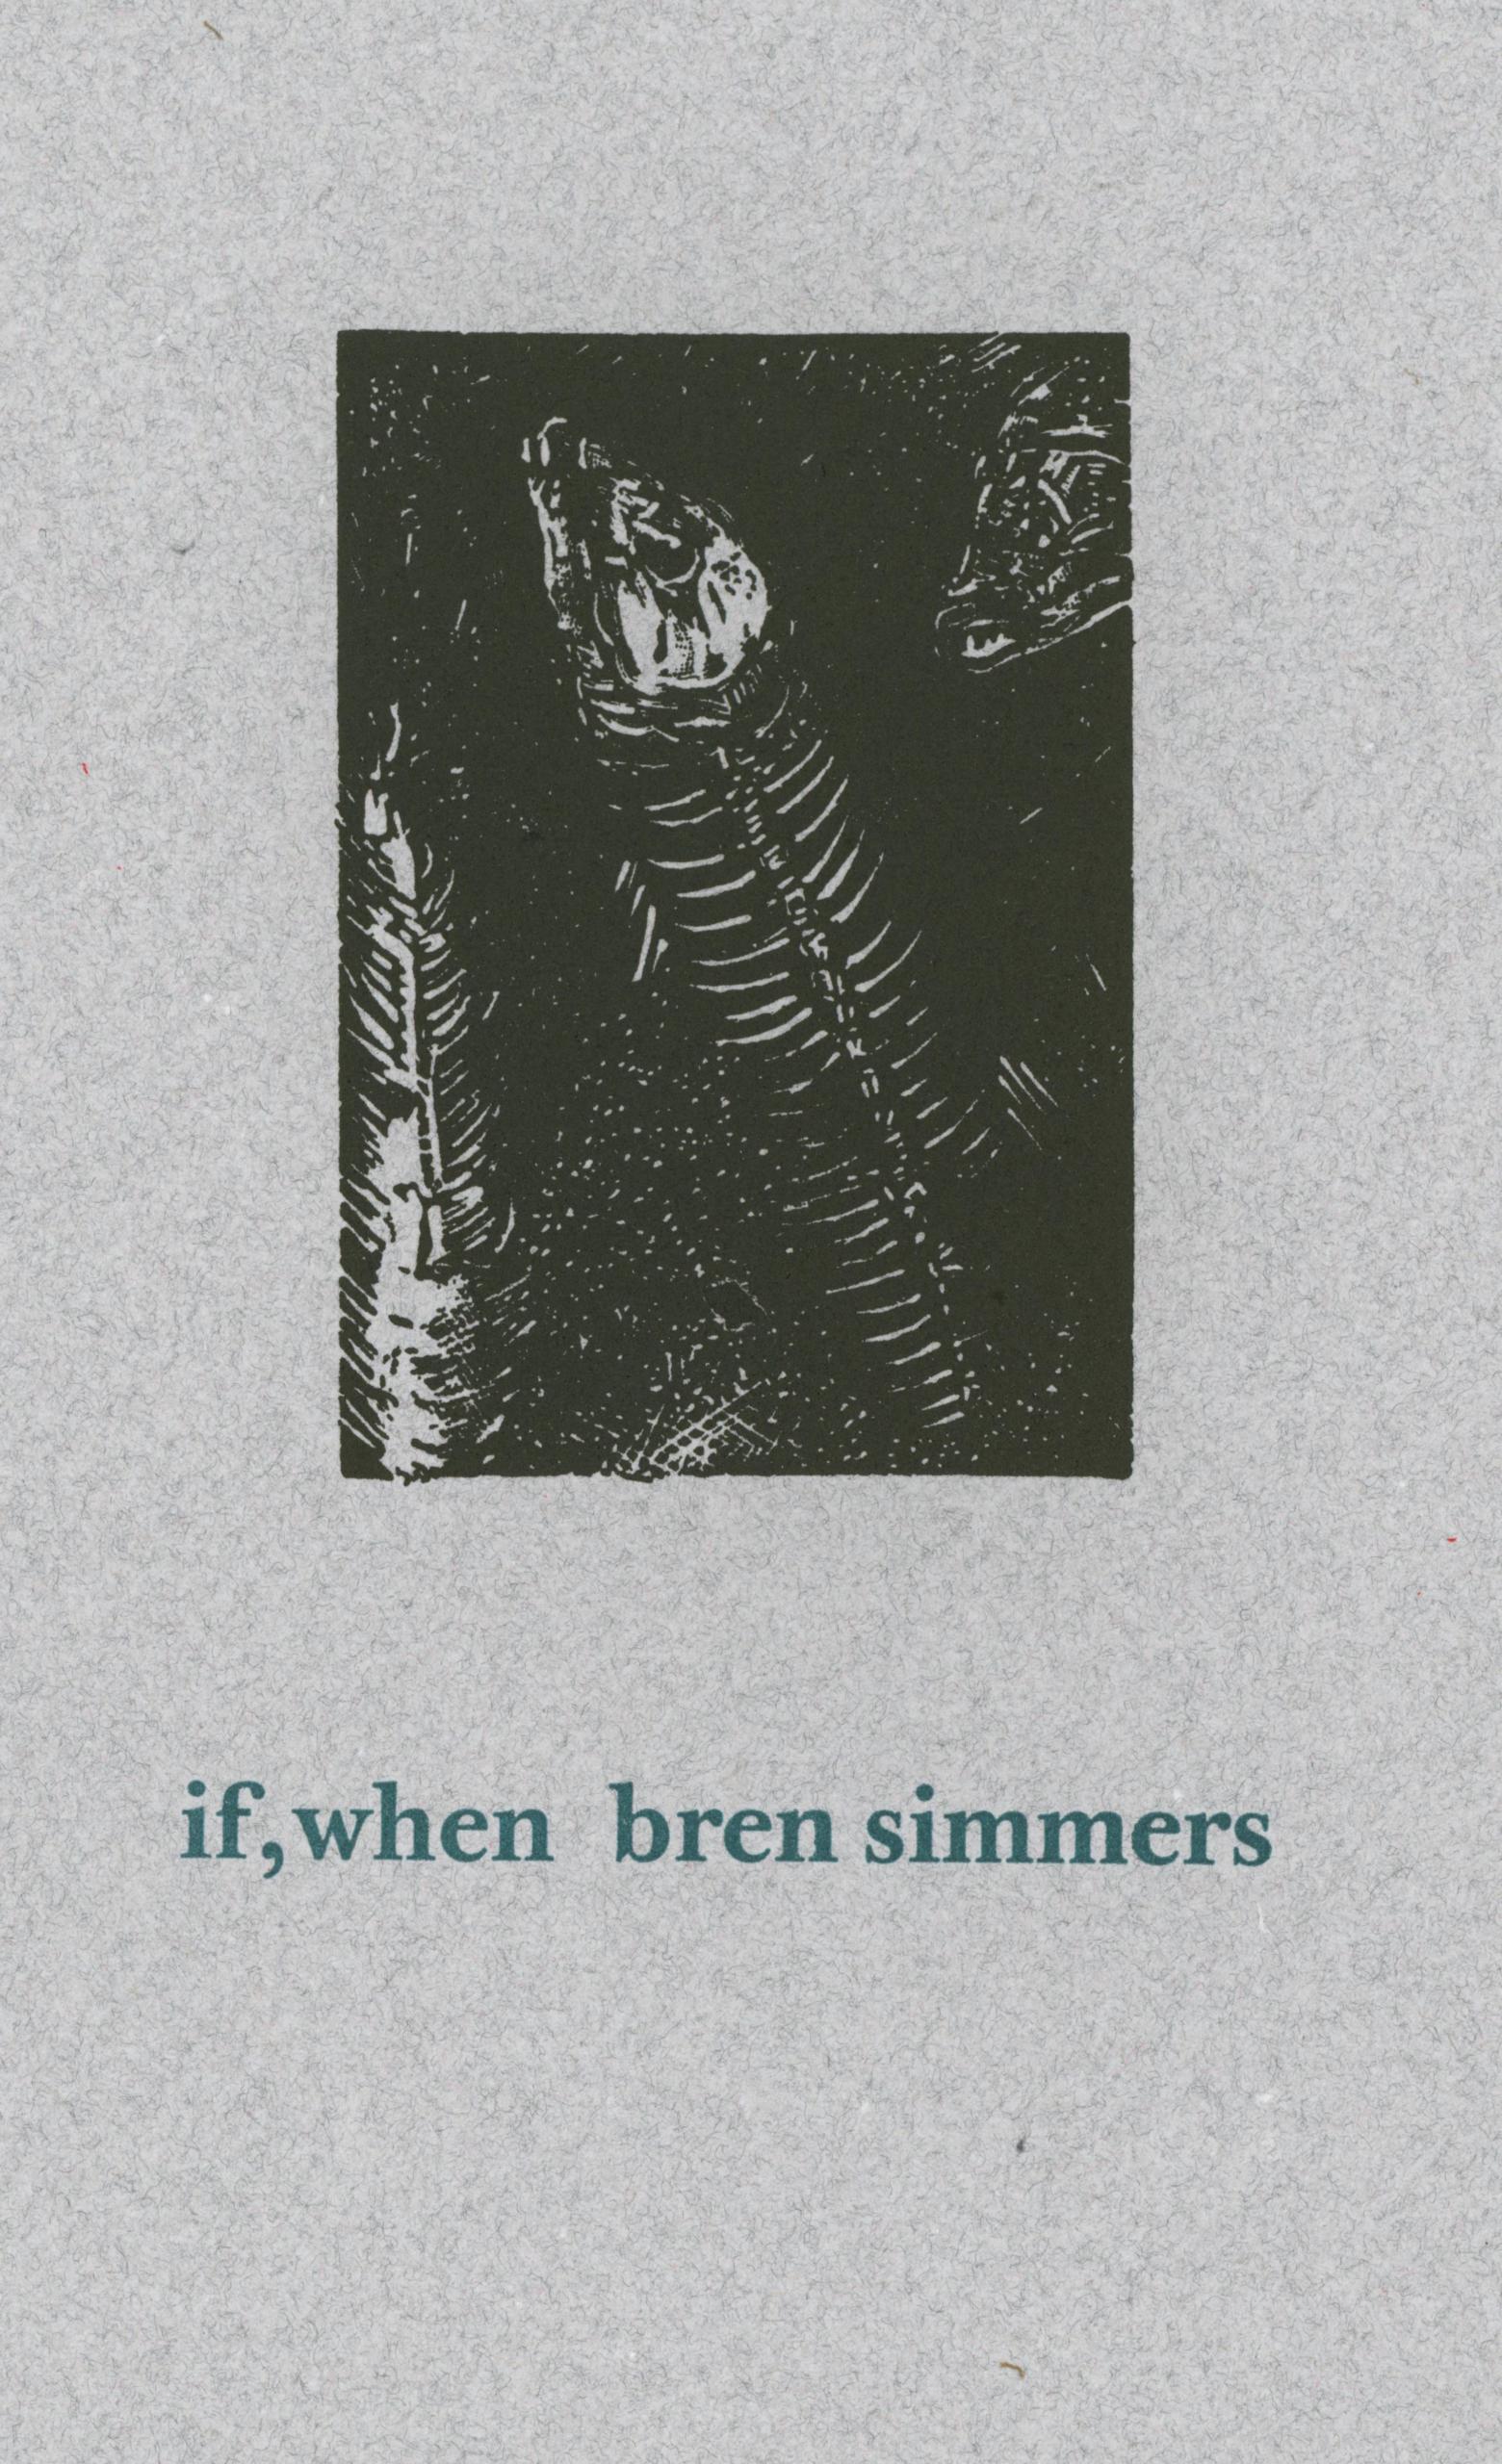 Annick MacAskill Reviews Bren Simmers Work of Labour and Inheritance